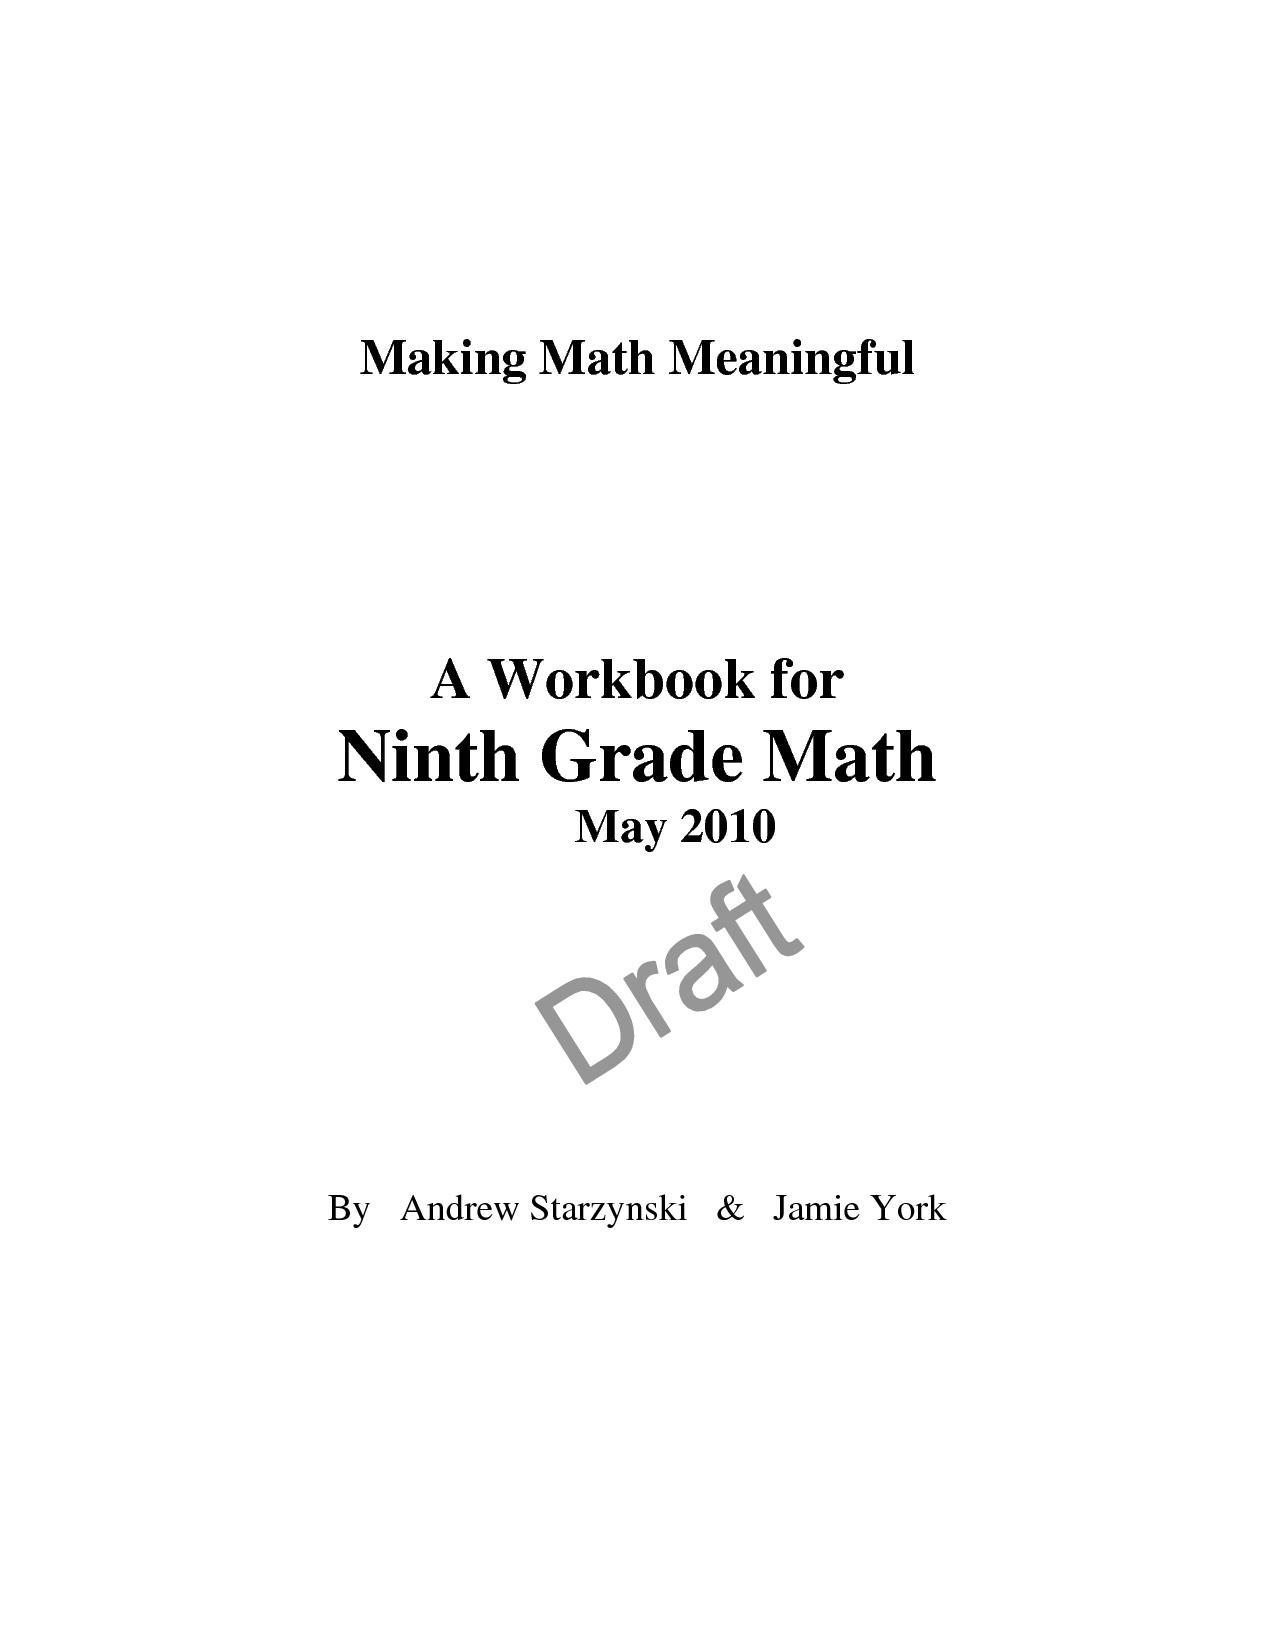 9th grade math workbook pdf